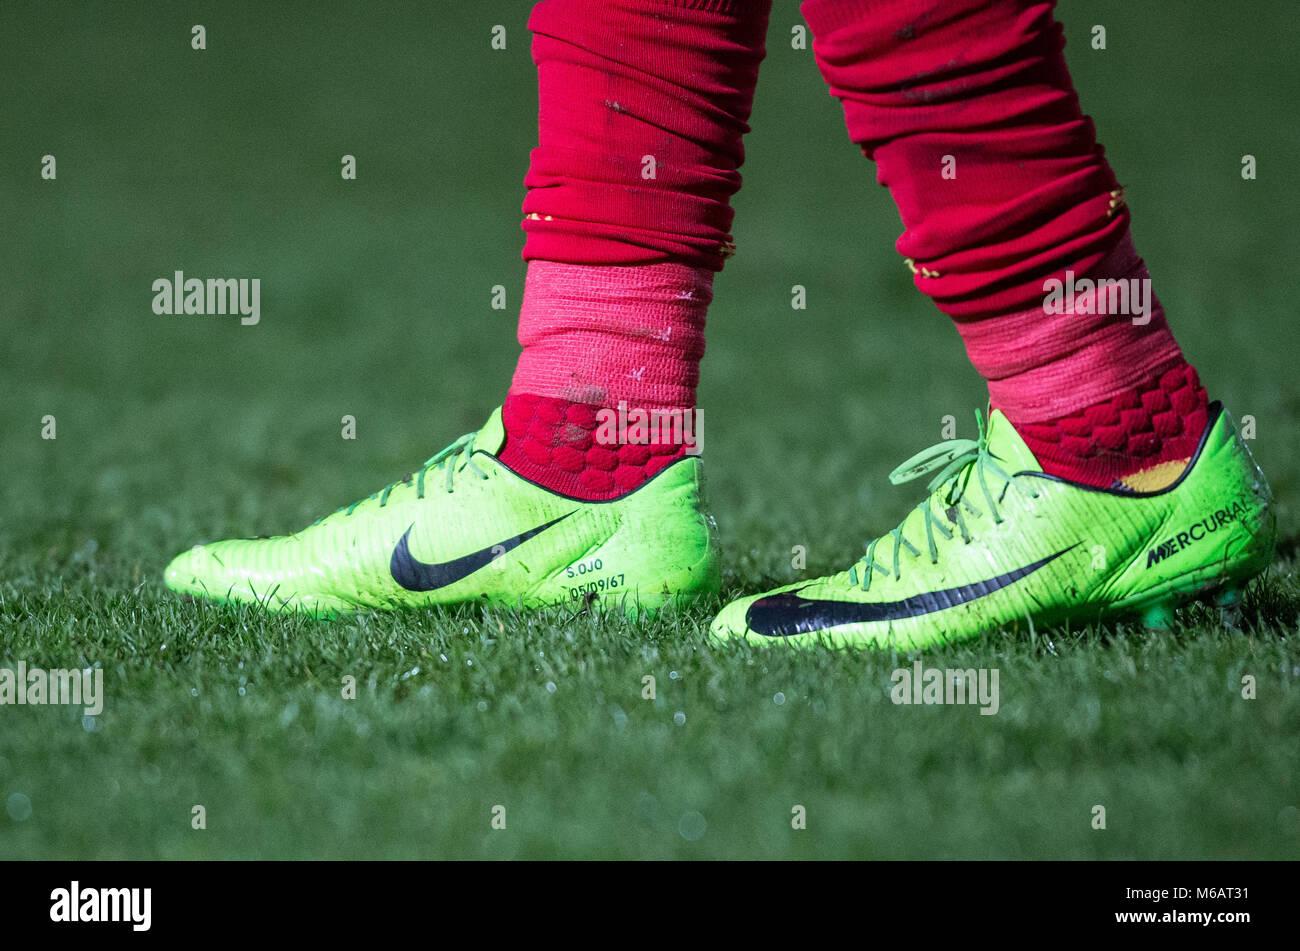 Sheyi Ojo von Liverpool Socken & personalisierte Nike